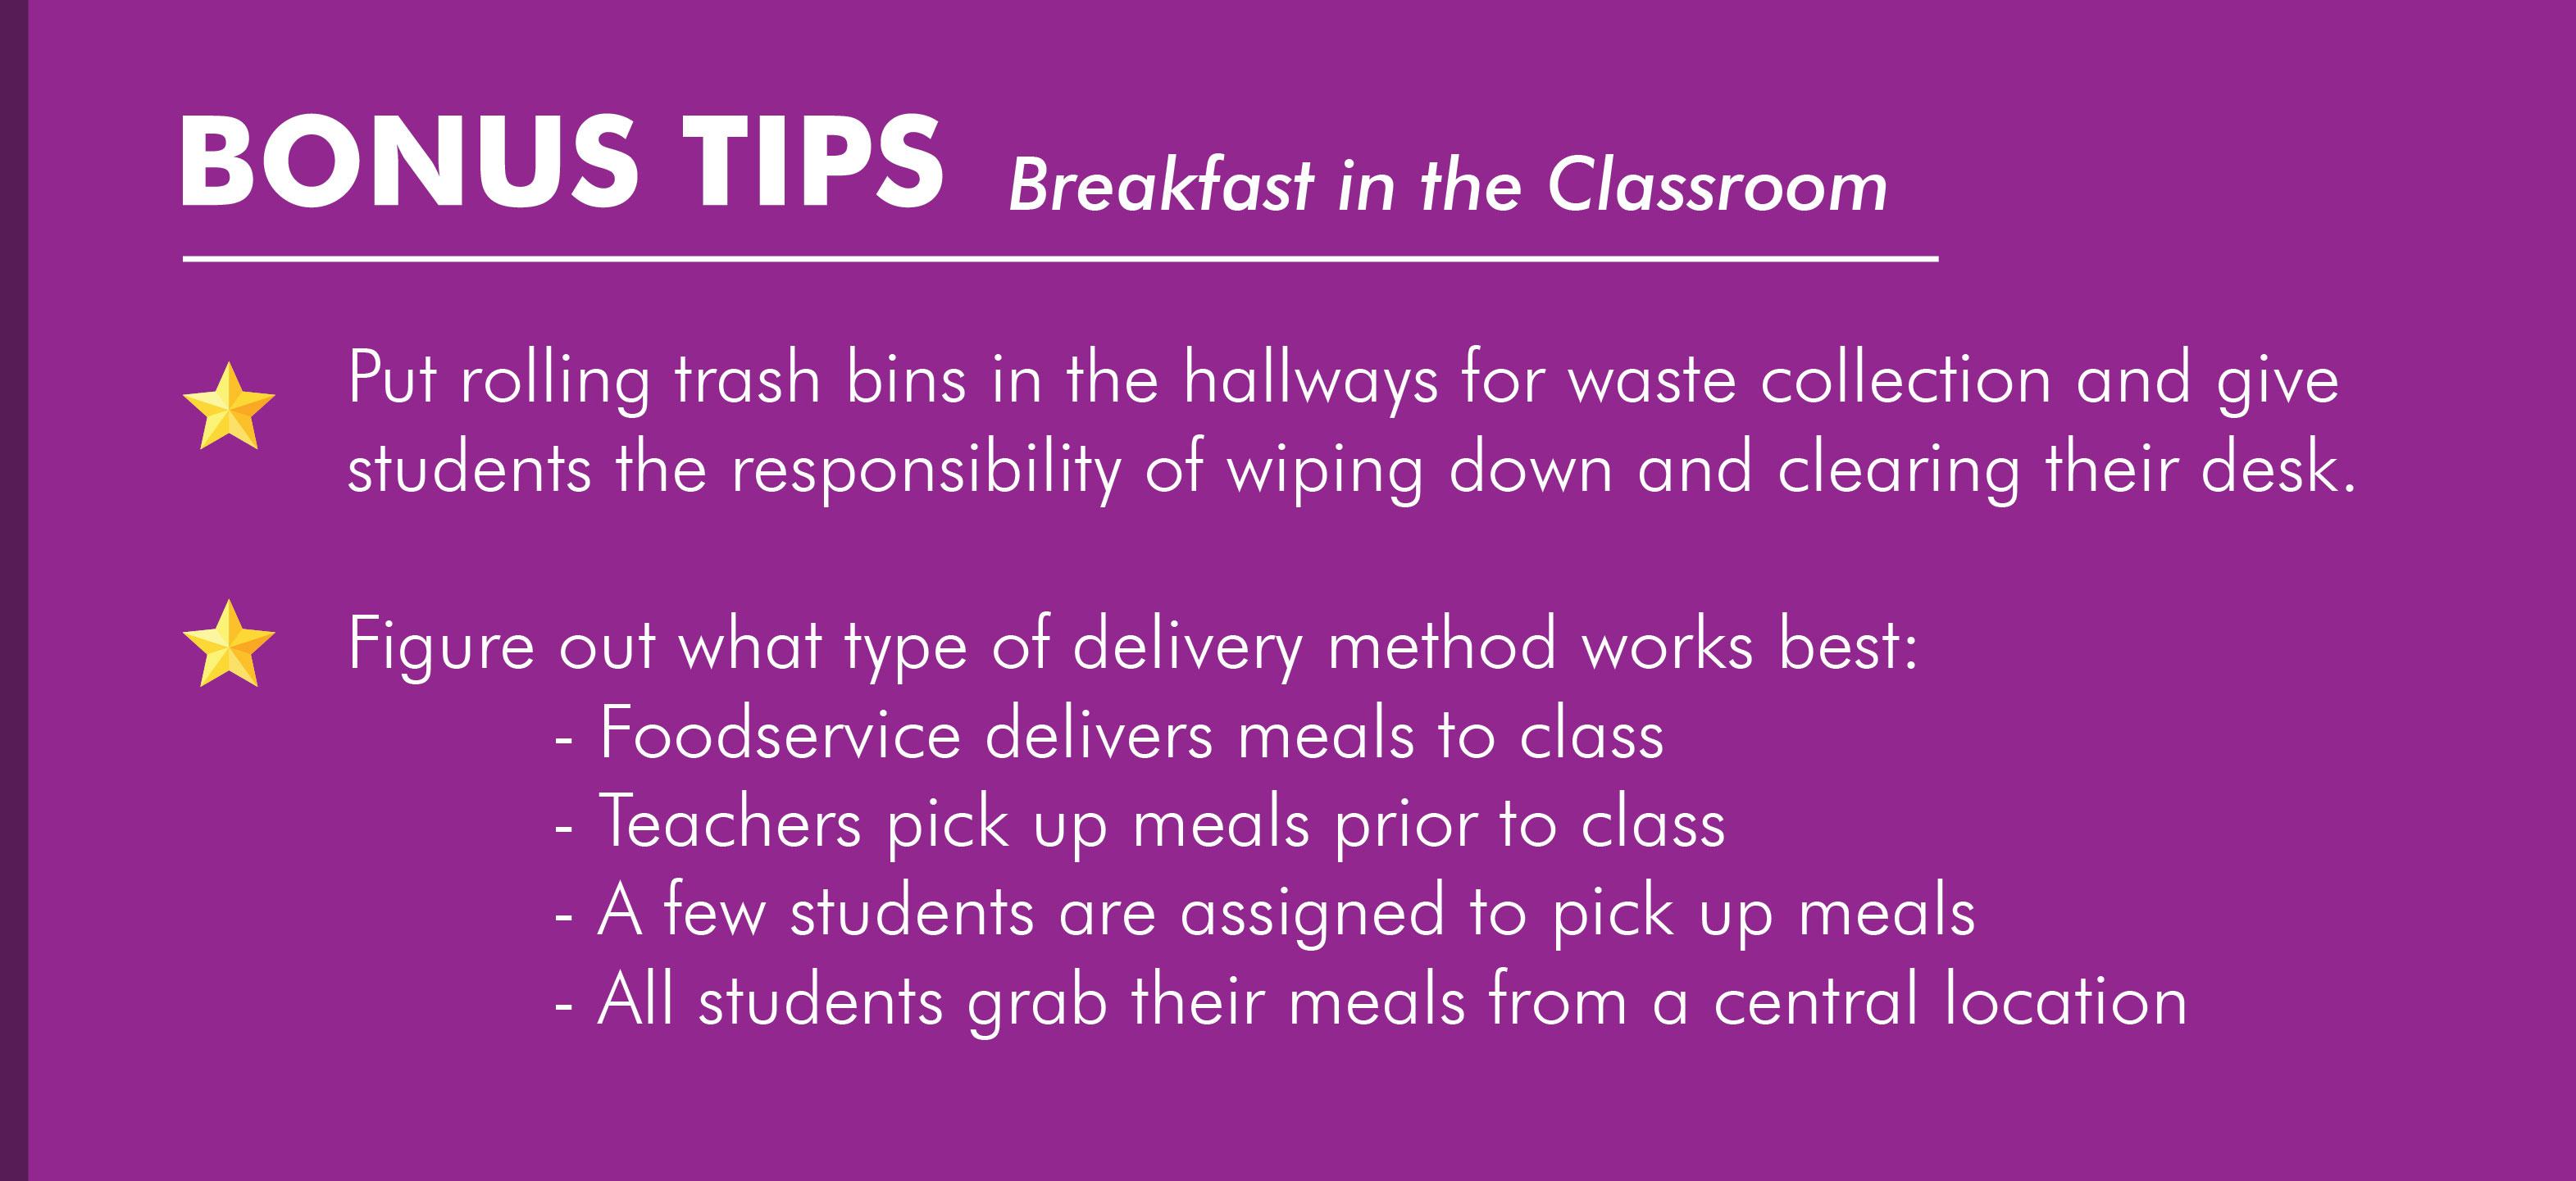 School Breakfast in the Classroom